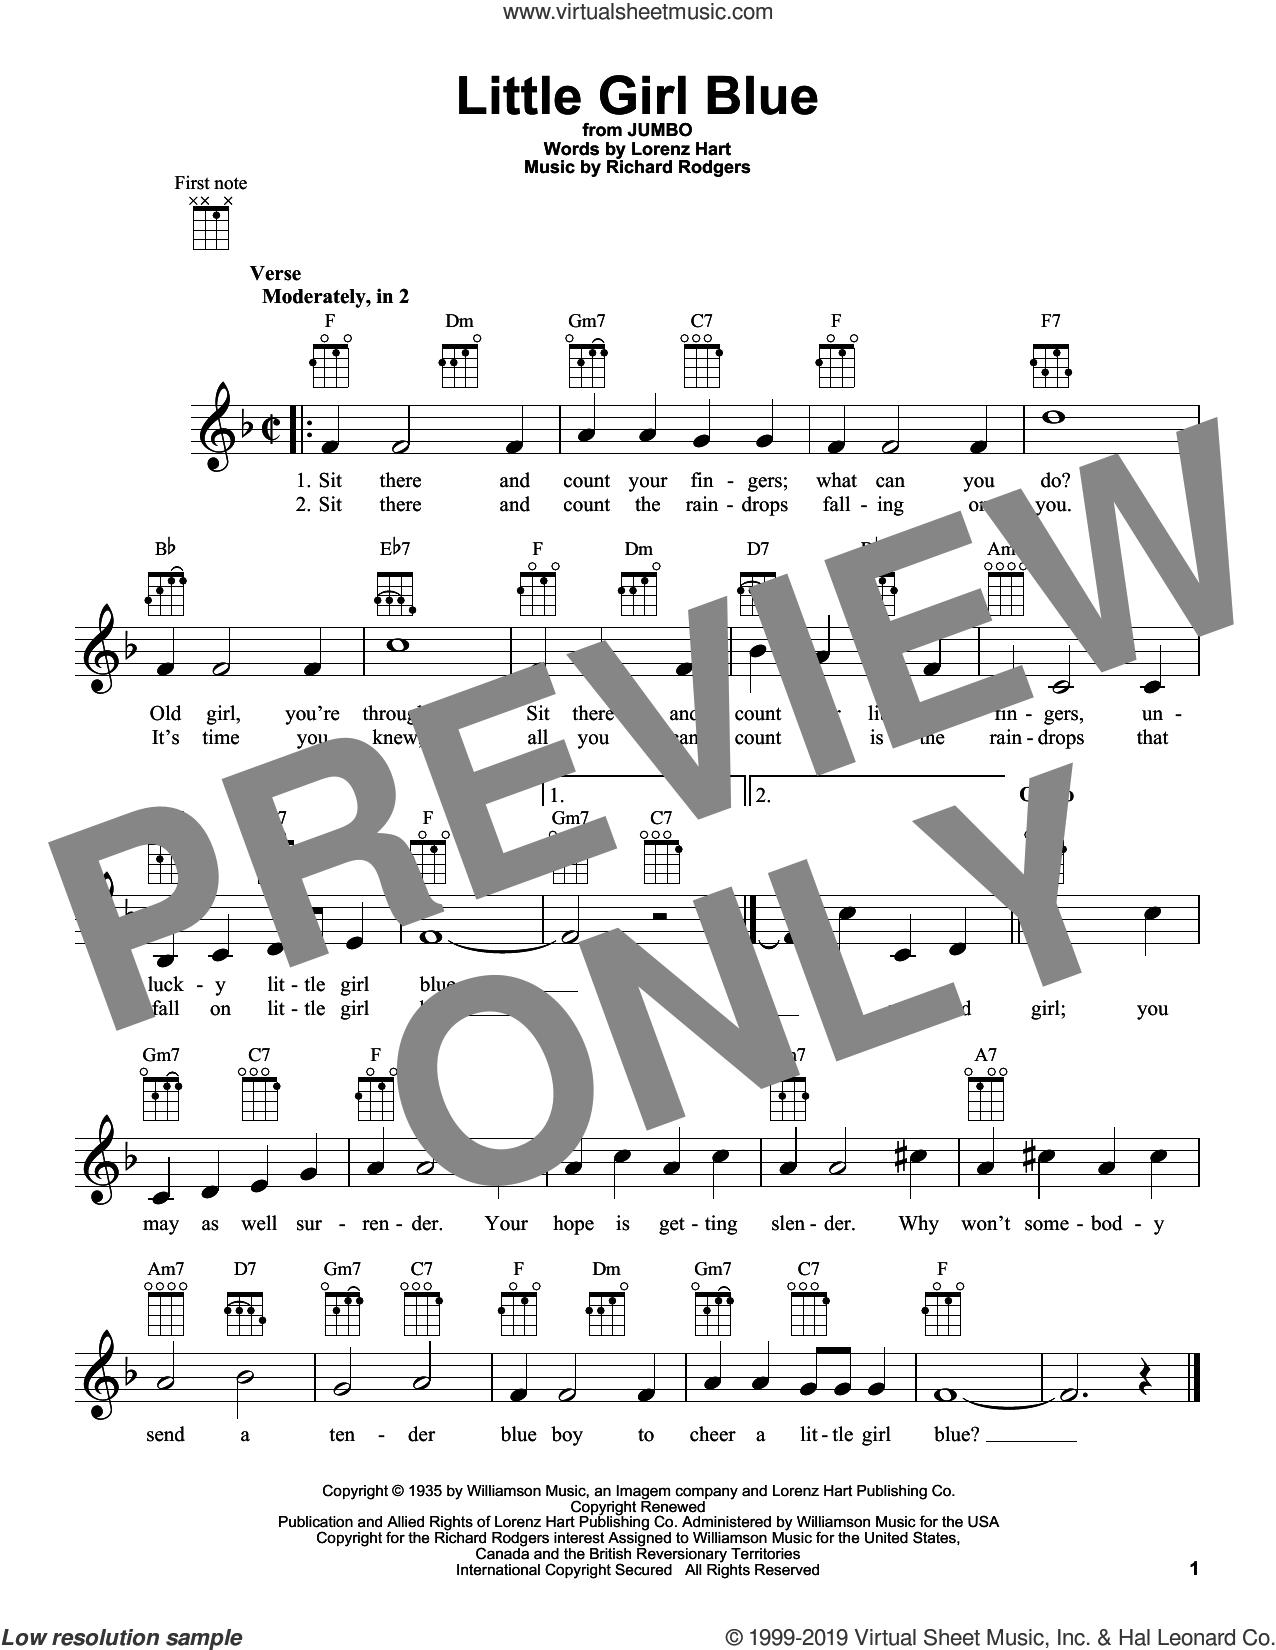 Little Girl Blue sheet music for ukulele by Rodgers & Hart, Lorenz Hart and Richard Rodgers, intermediate skill level